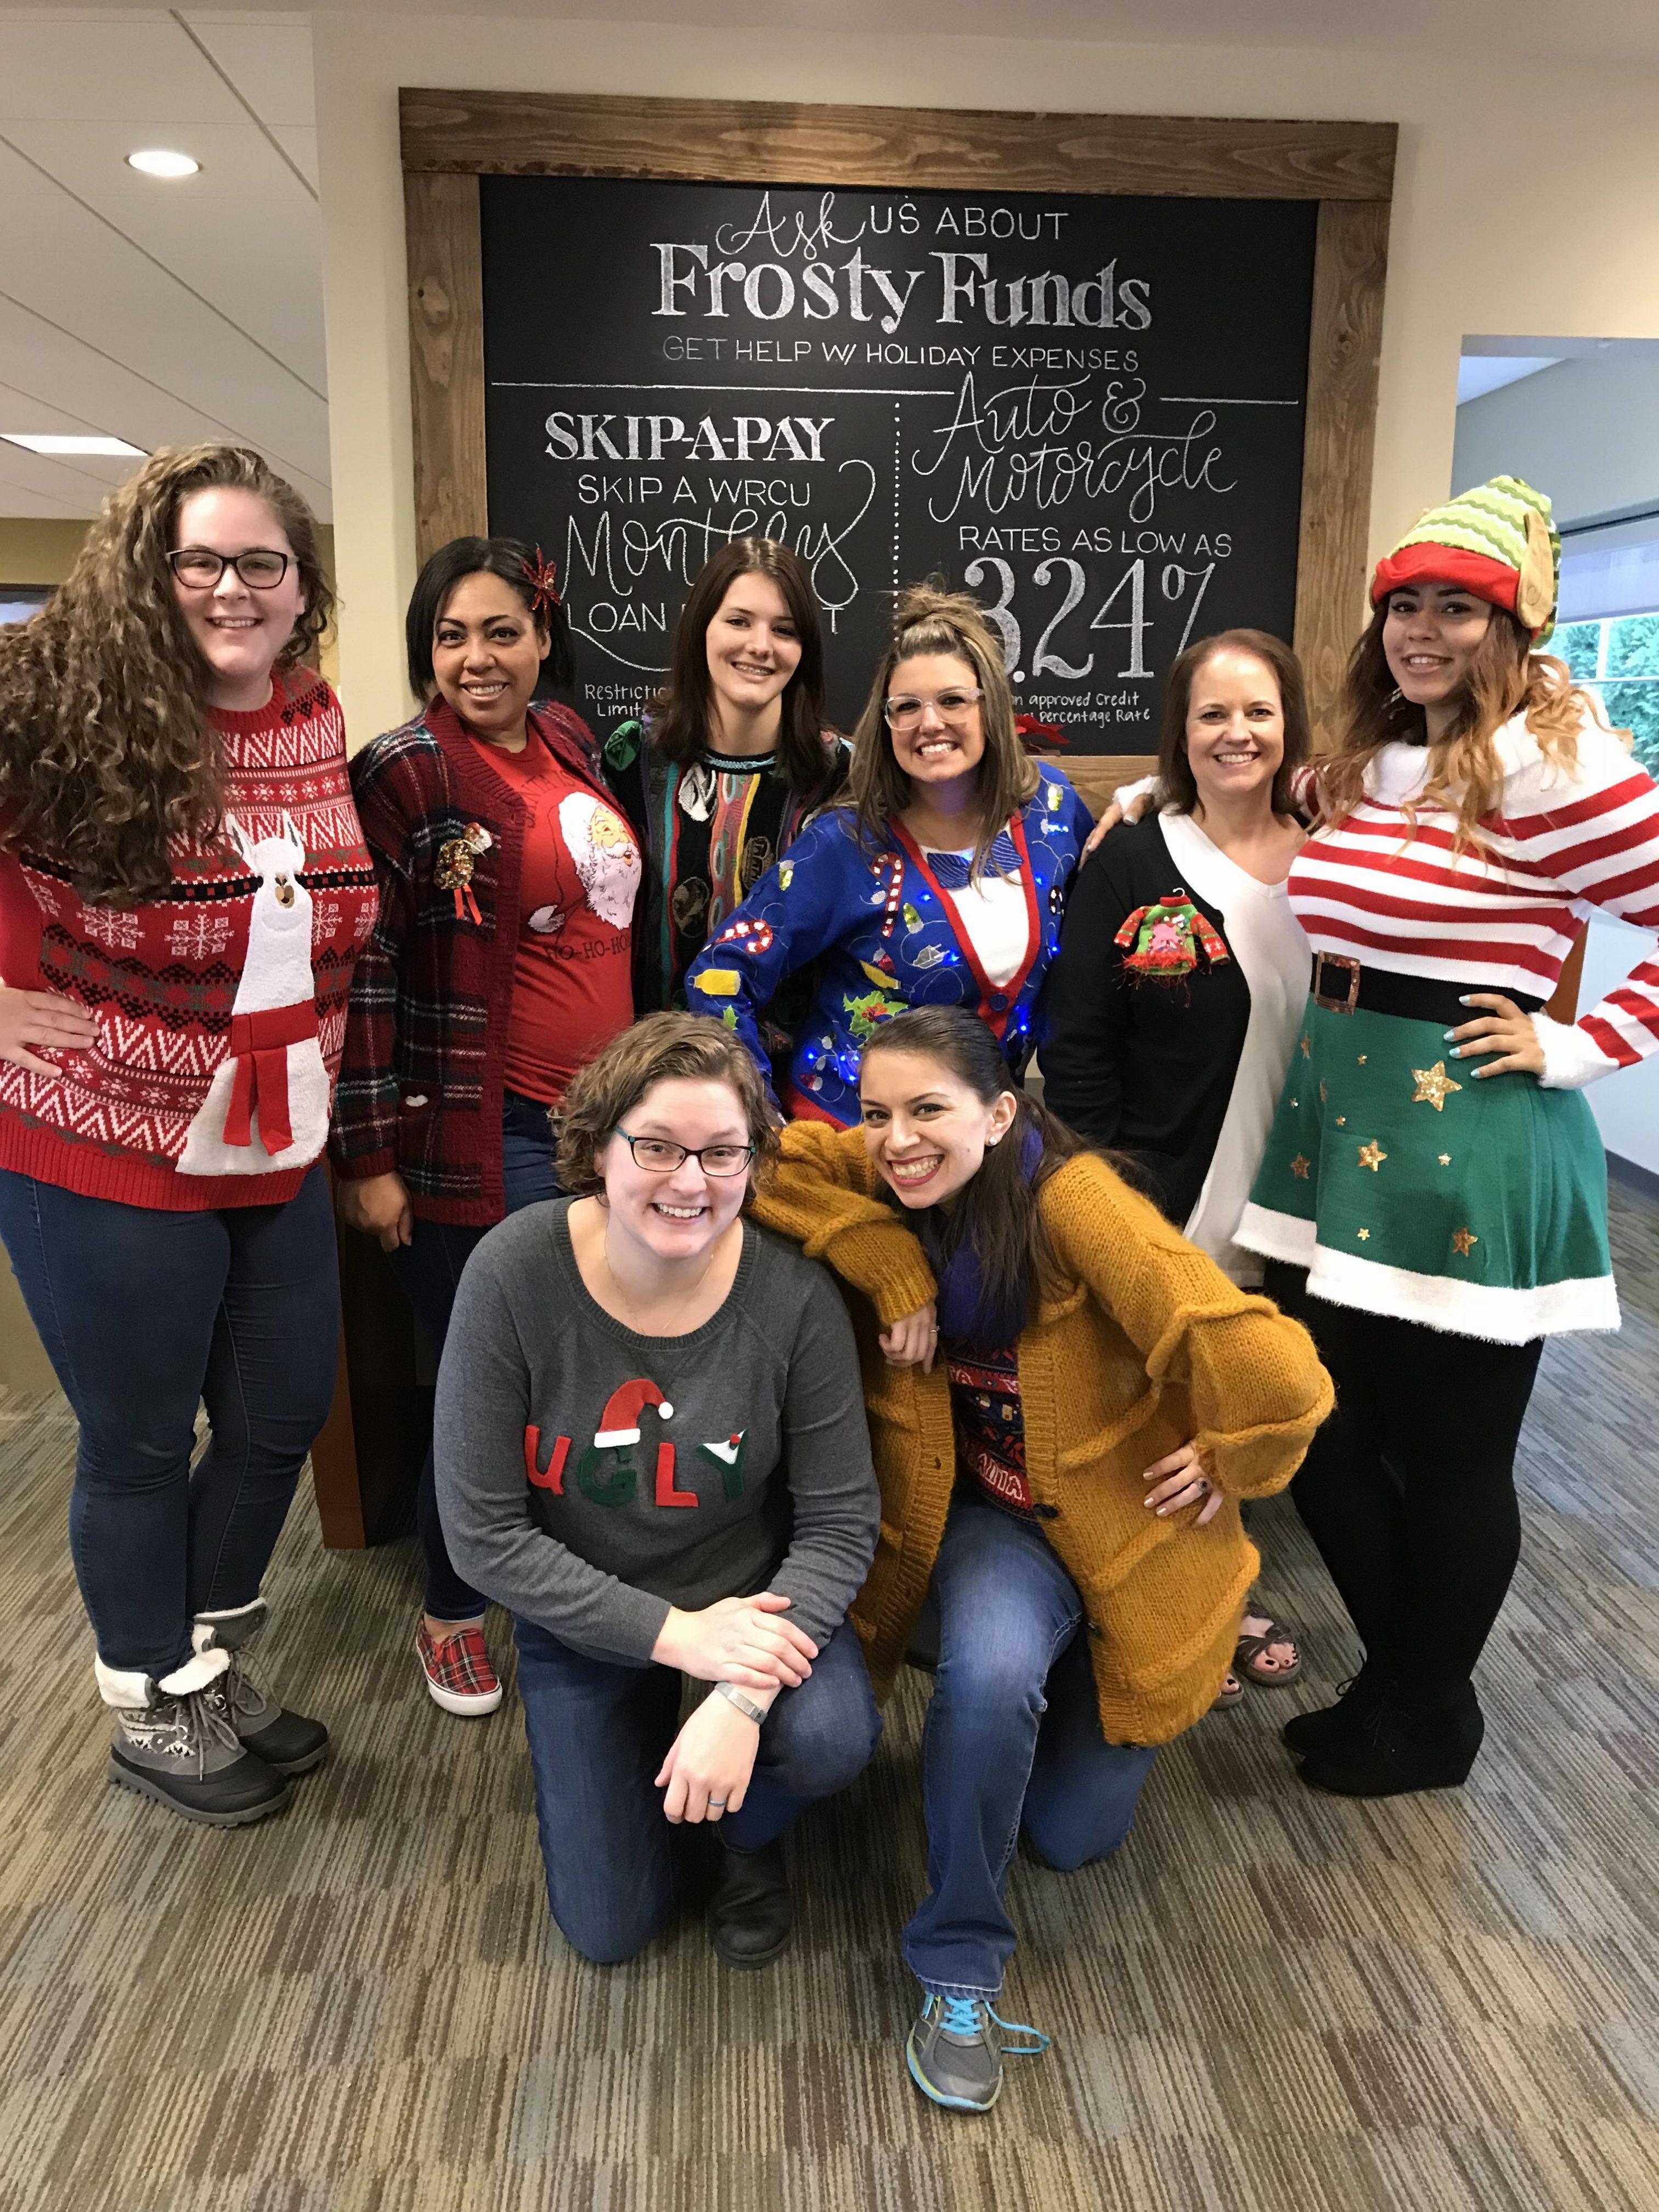 WRCU staff in group photo